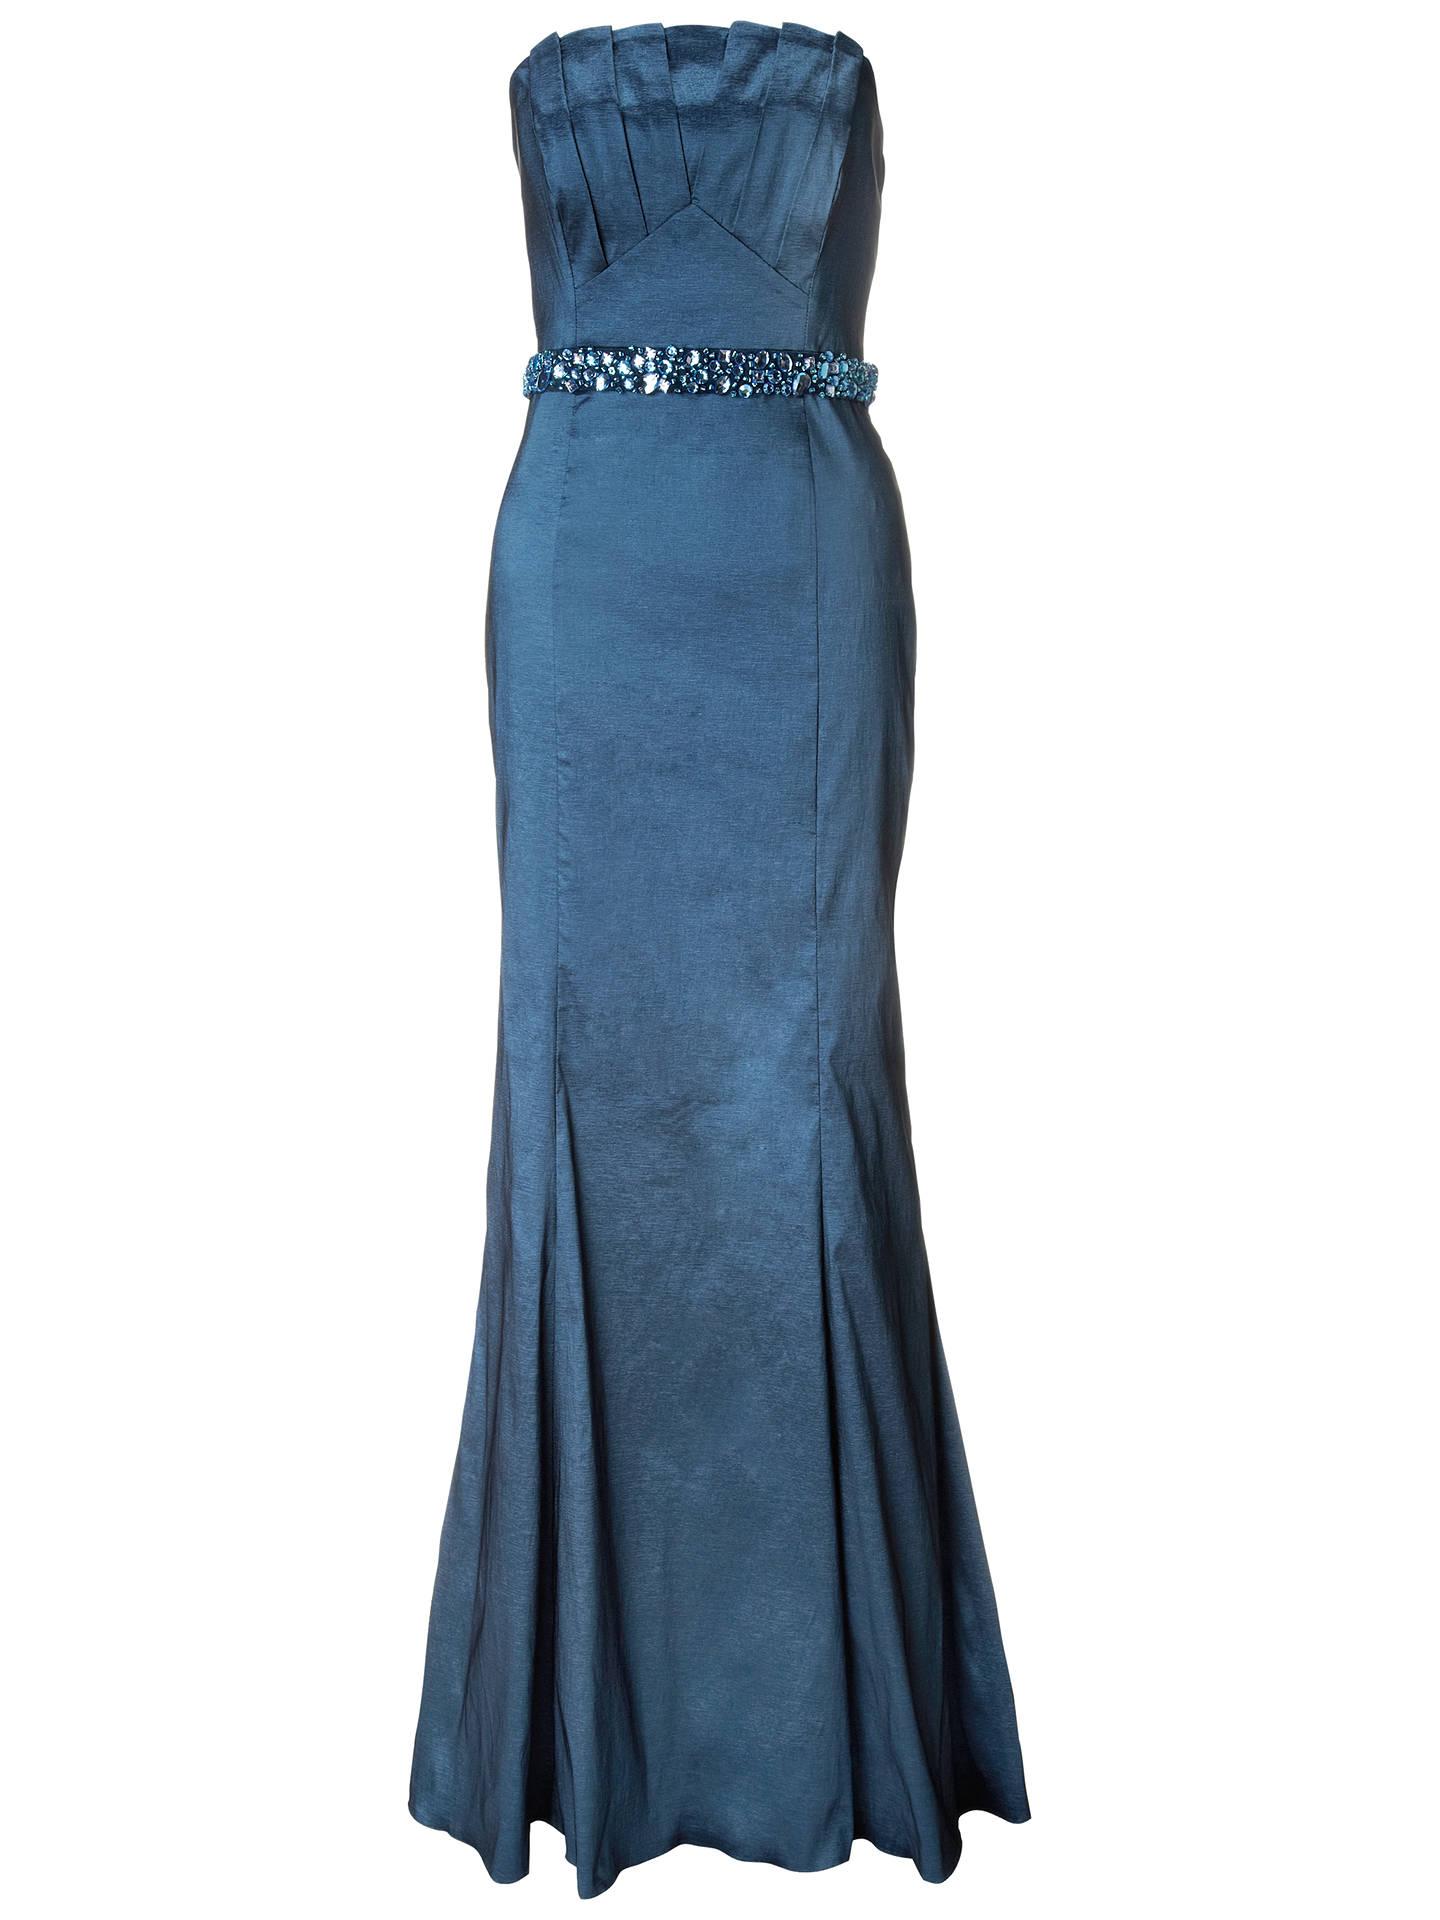 5c503d302fda Ariella Denise Stretch Taffeta Long Strapless Dress, Blue at John ...